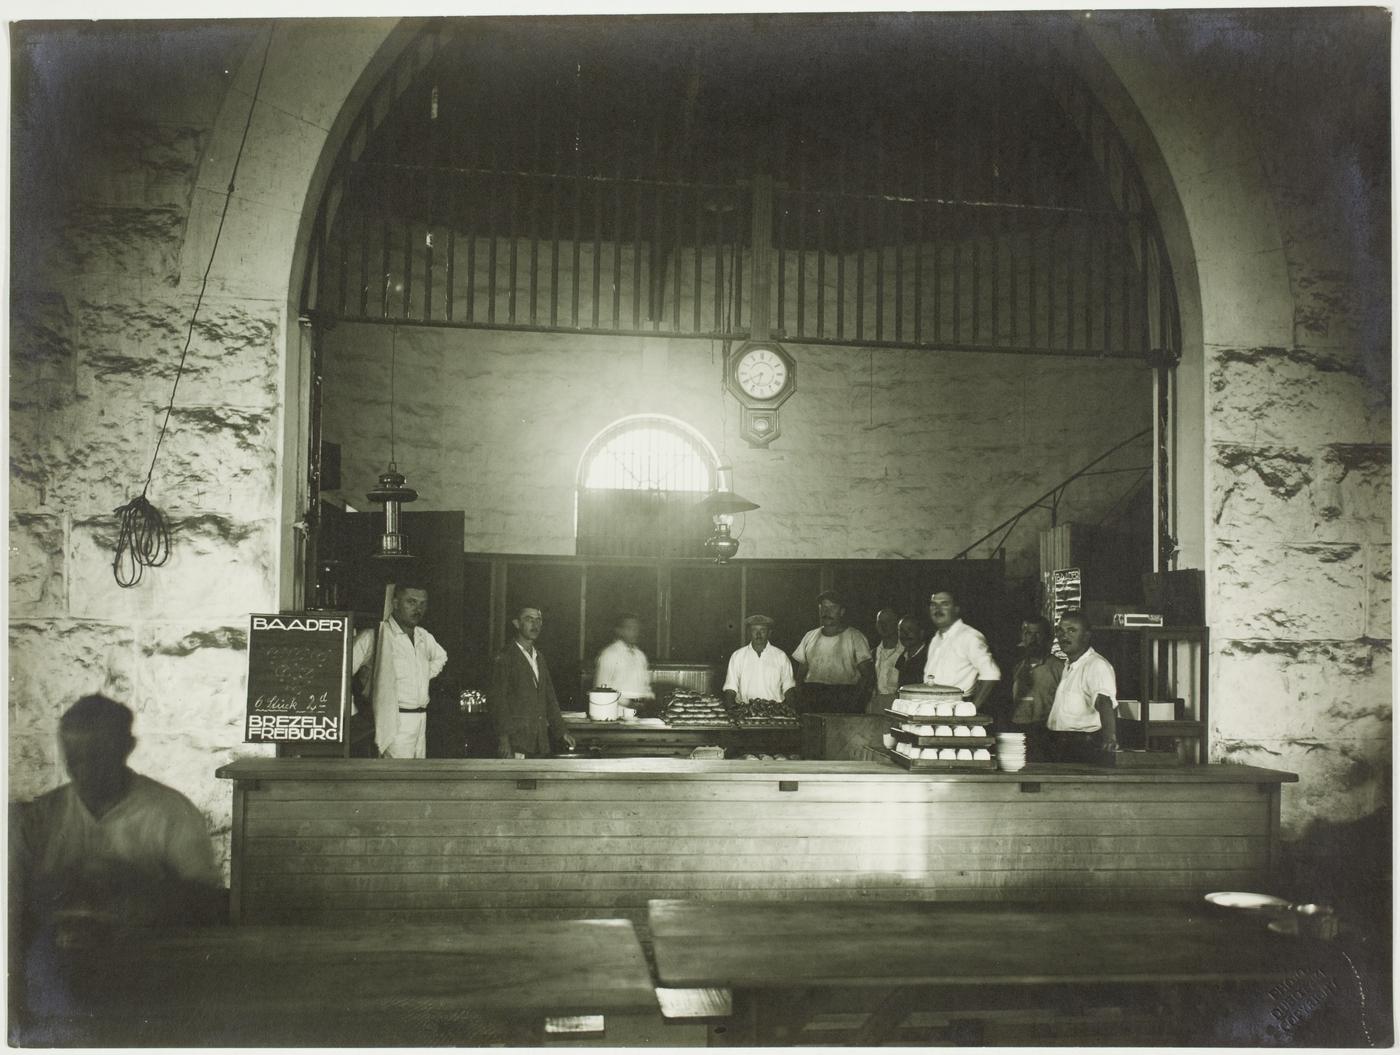 Enterprise Café Trial Bay WW1